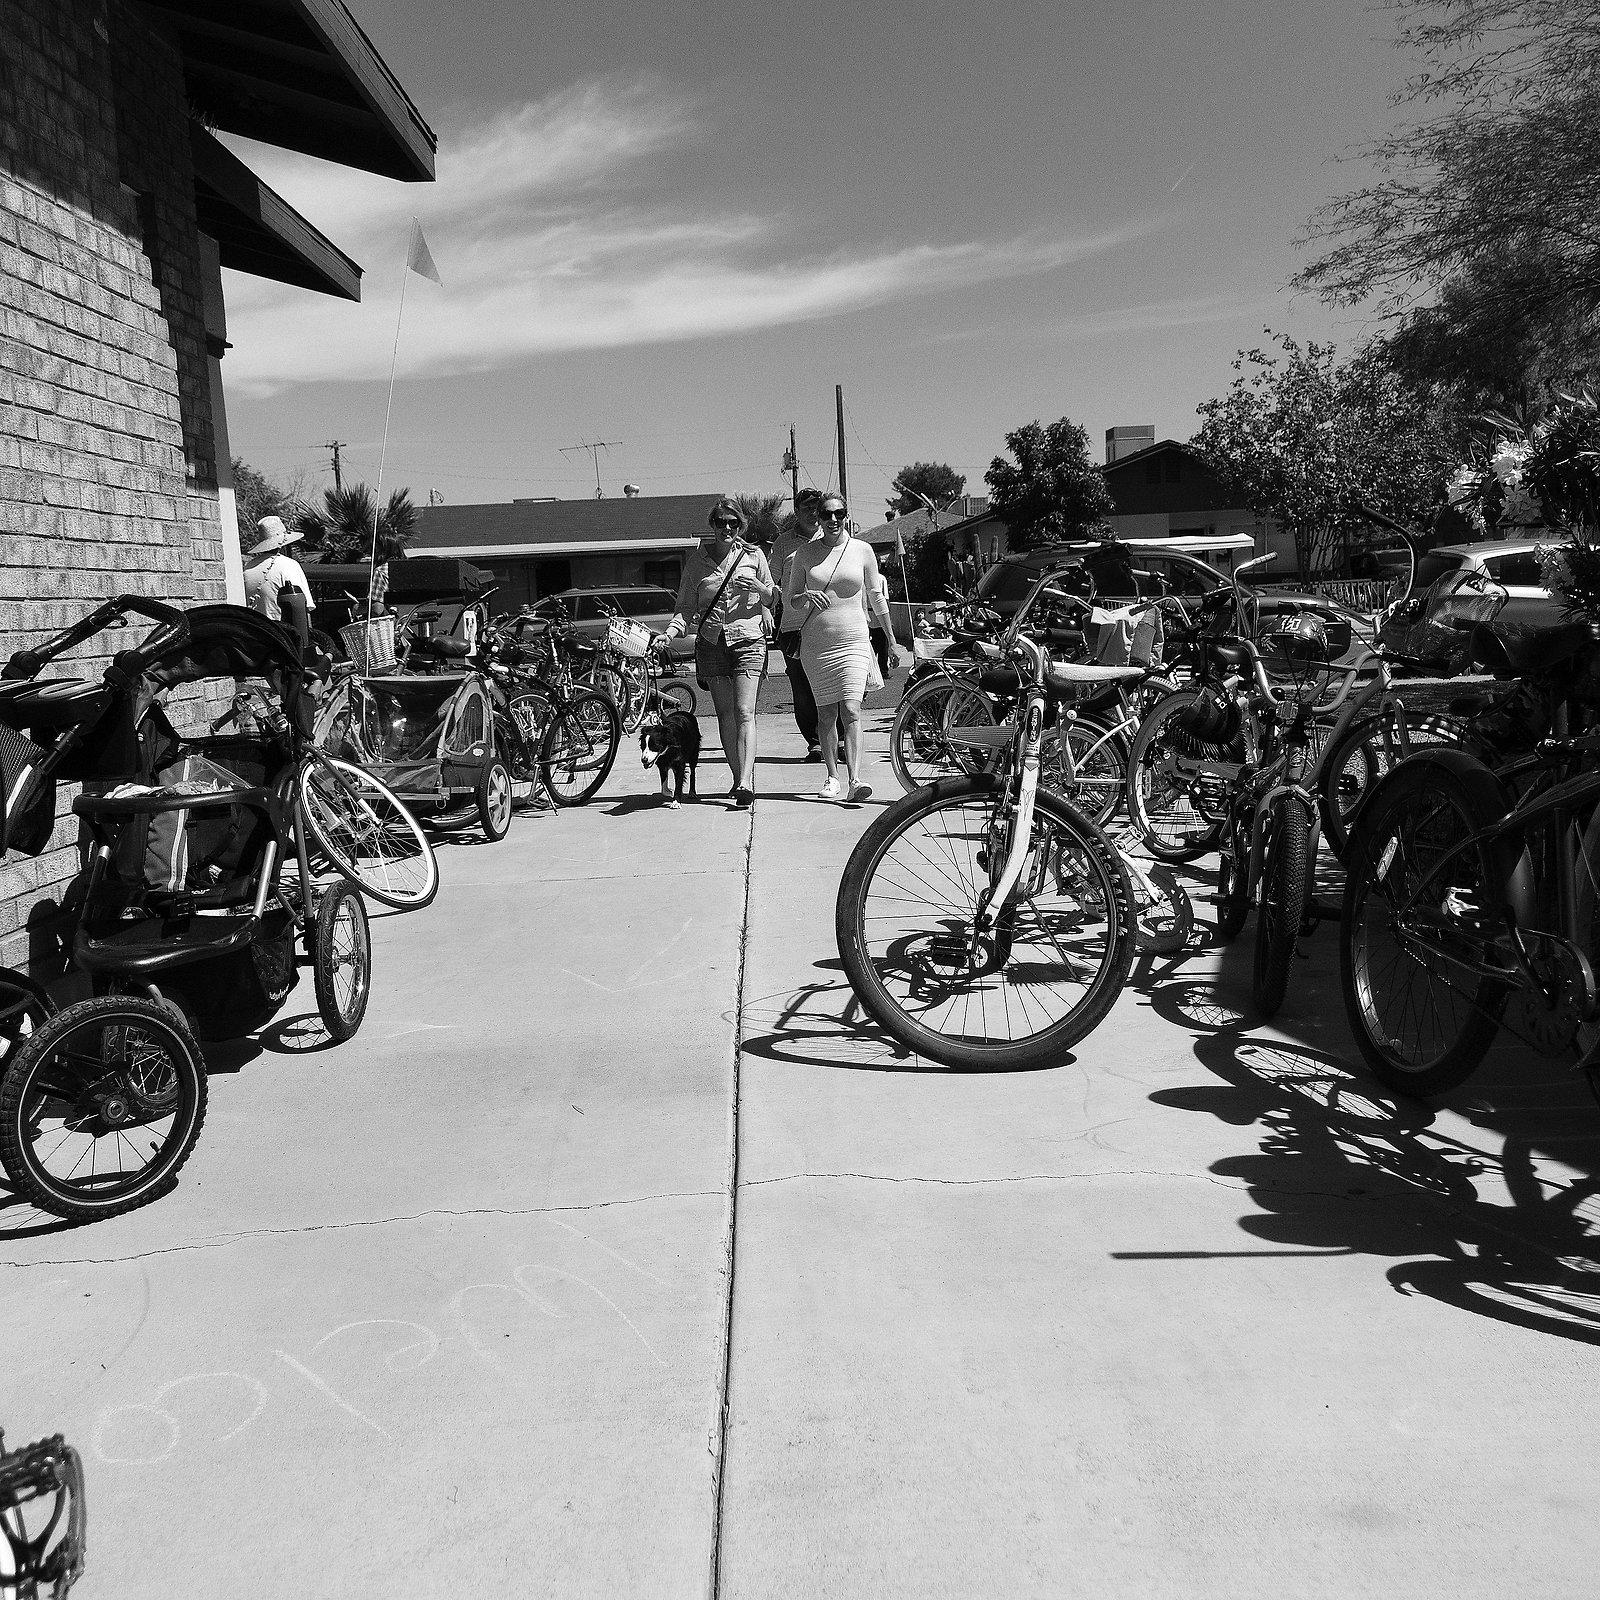 BicyclesDogs.jpg